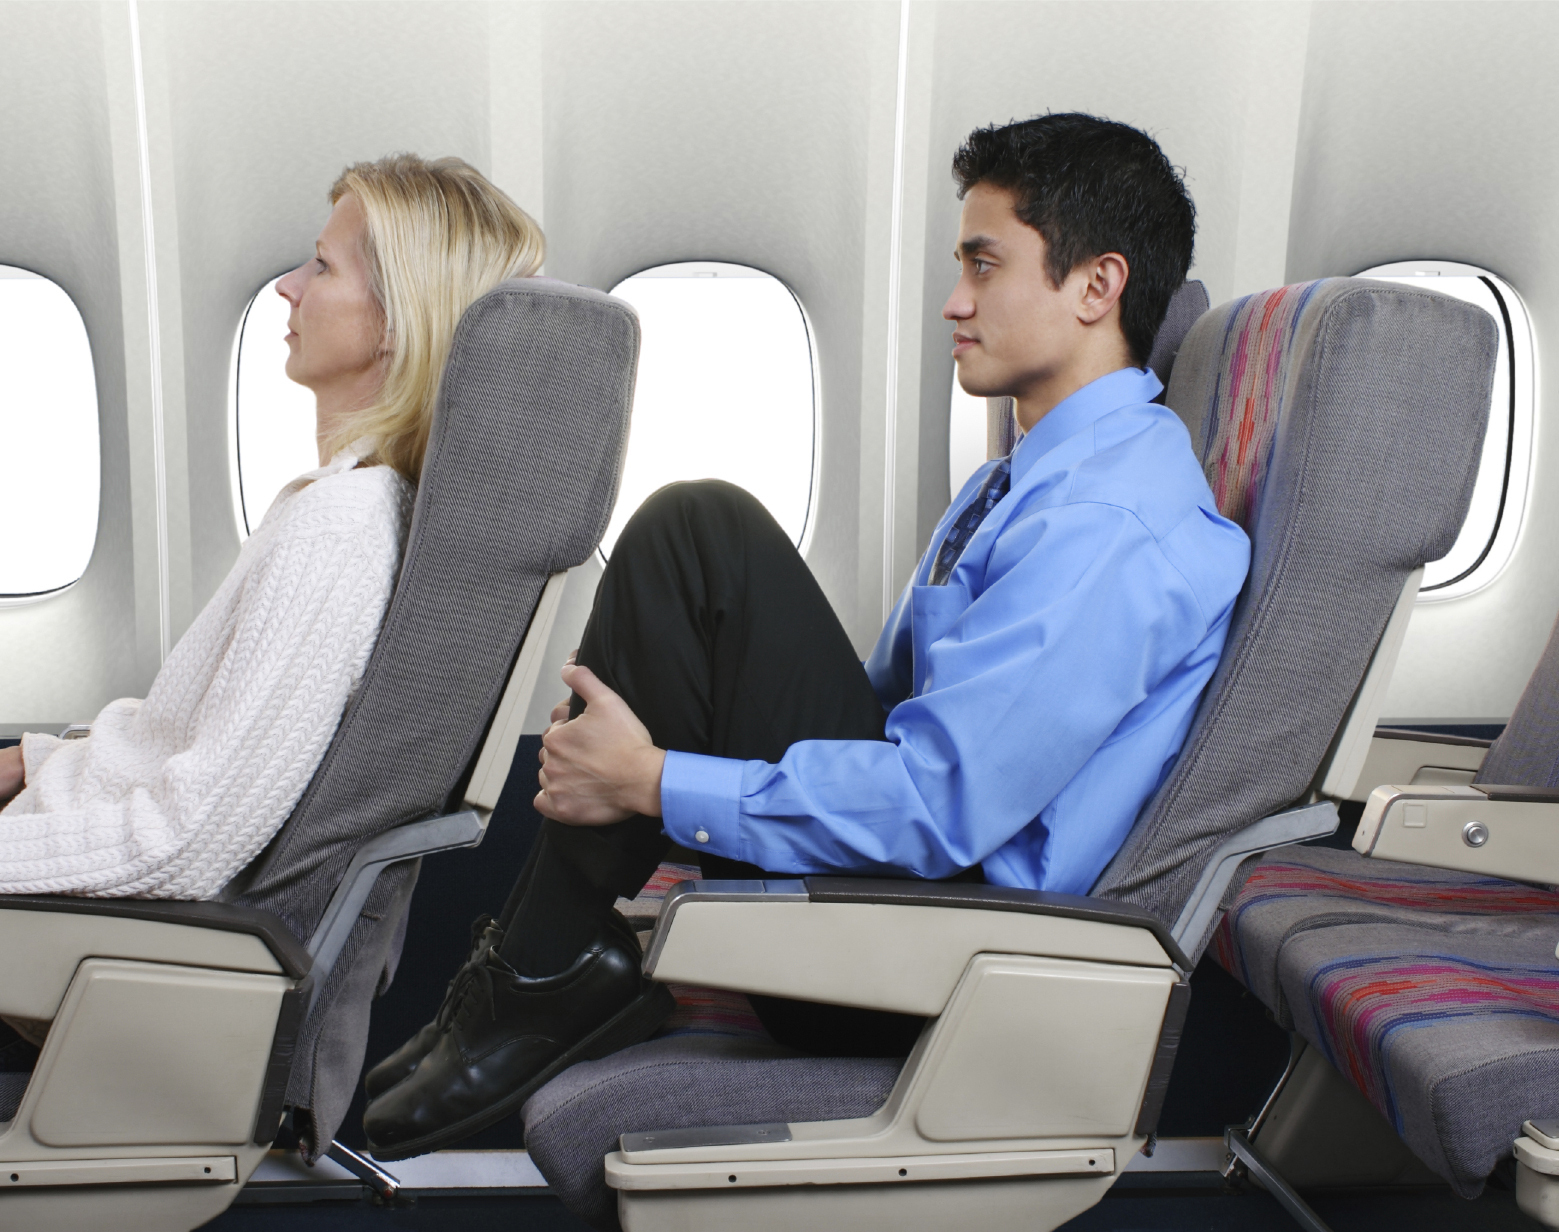 Economy-Class_sendrom_syndrome_aircraft_seat